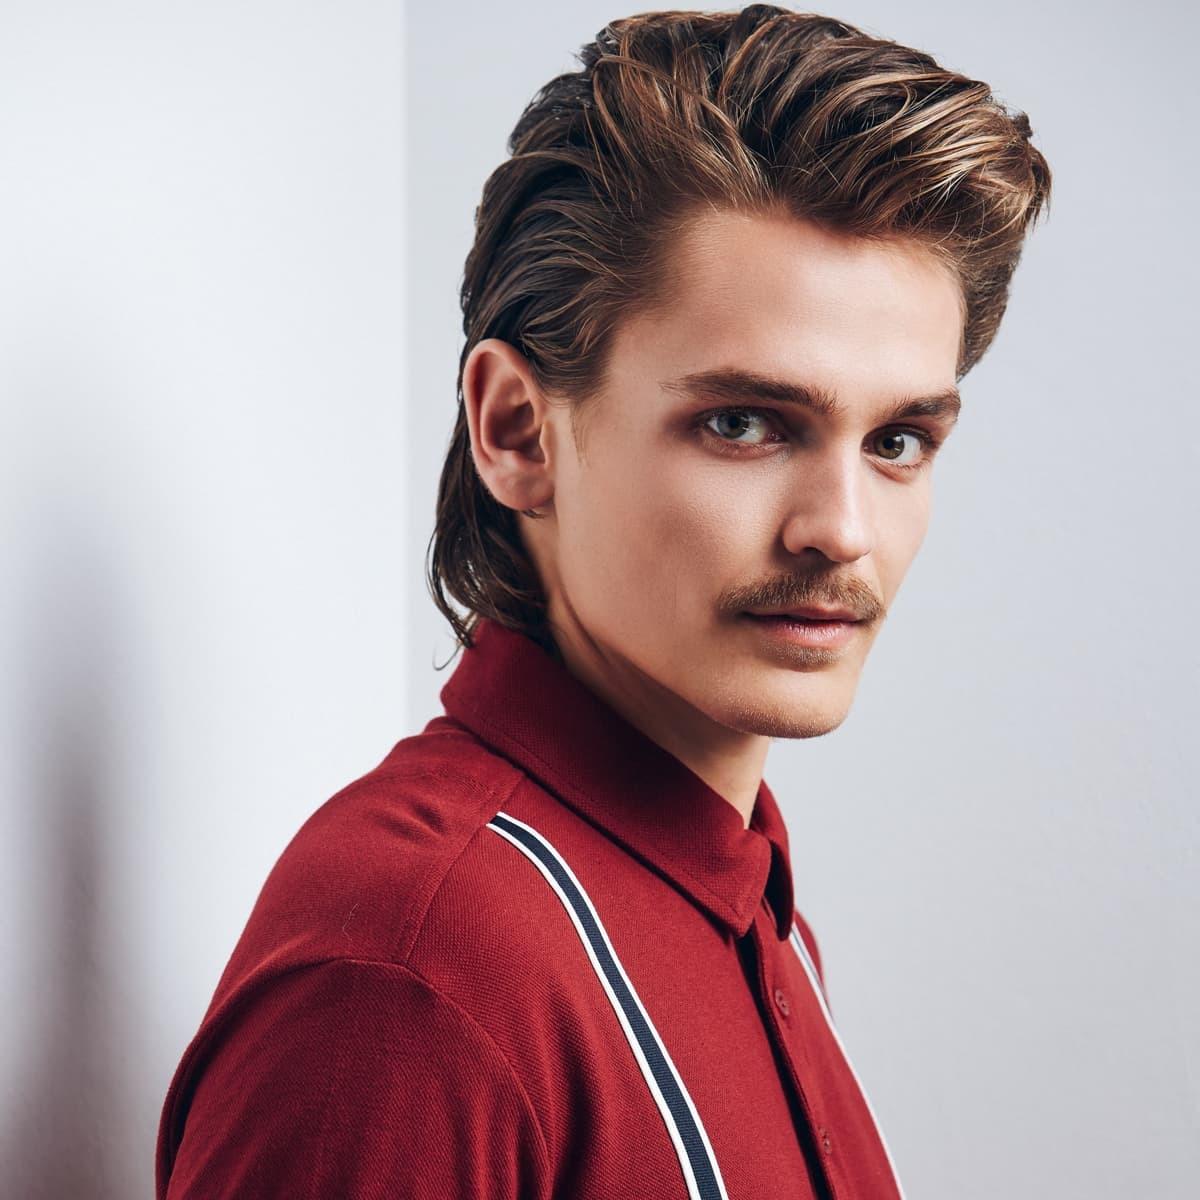 Frisuren Mode 2019  Frisuren 2019 Herren New Vokuhila